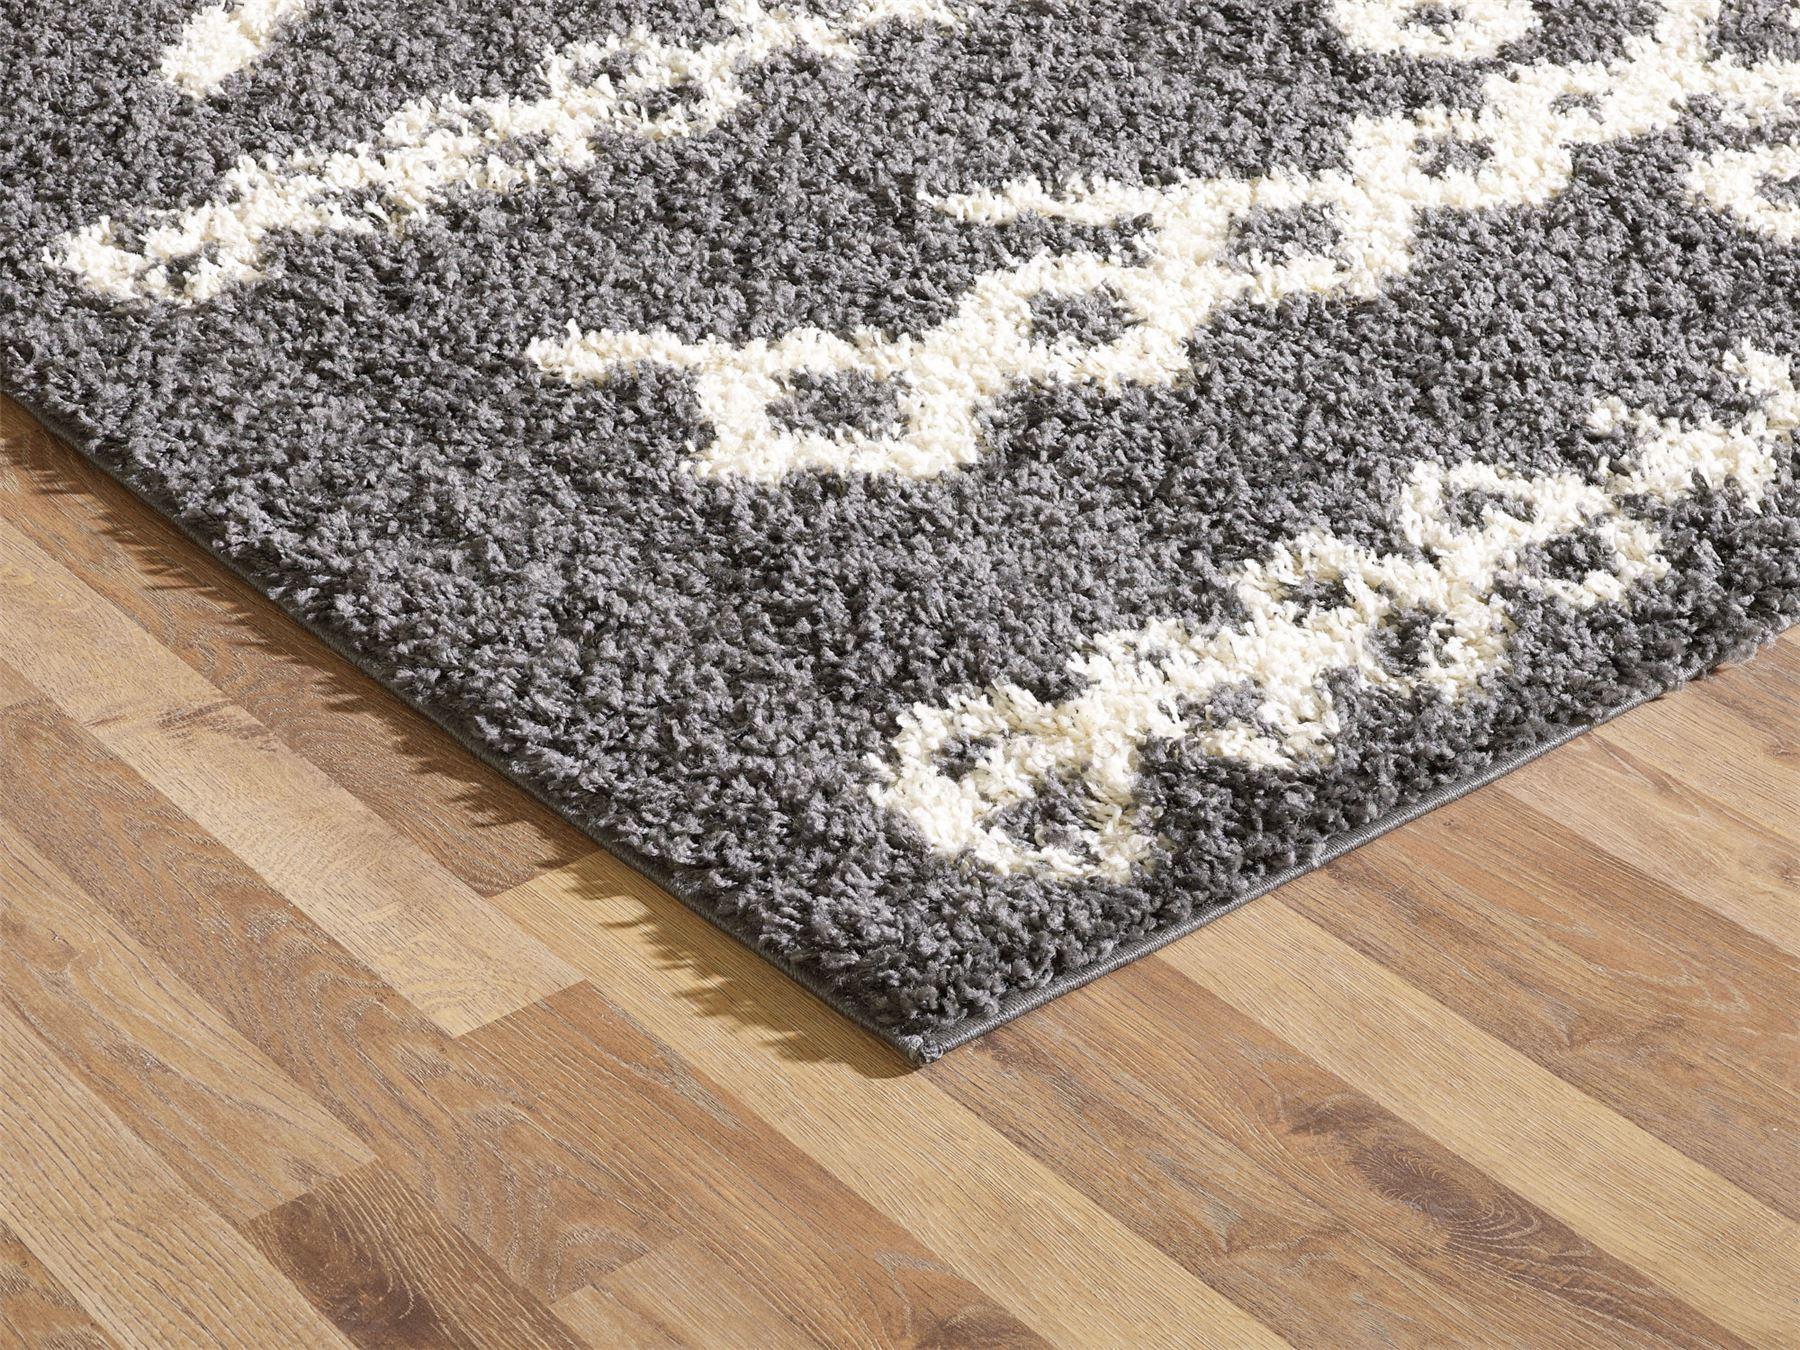 Moroccan-Shaggy-Area-Rug-Grey-White-Black-Soft-Carpet-Traditional-Berber-Designs thumbnail 11